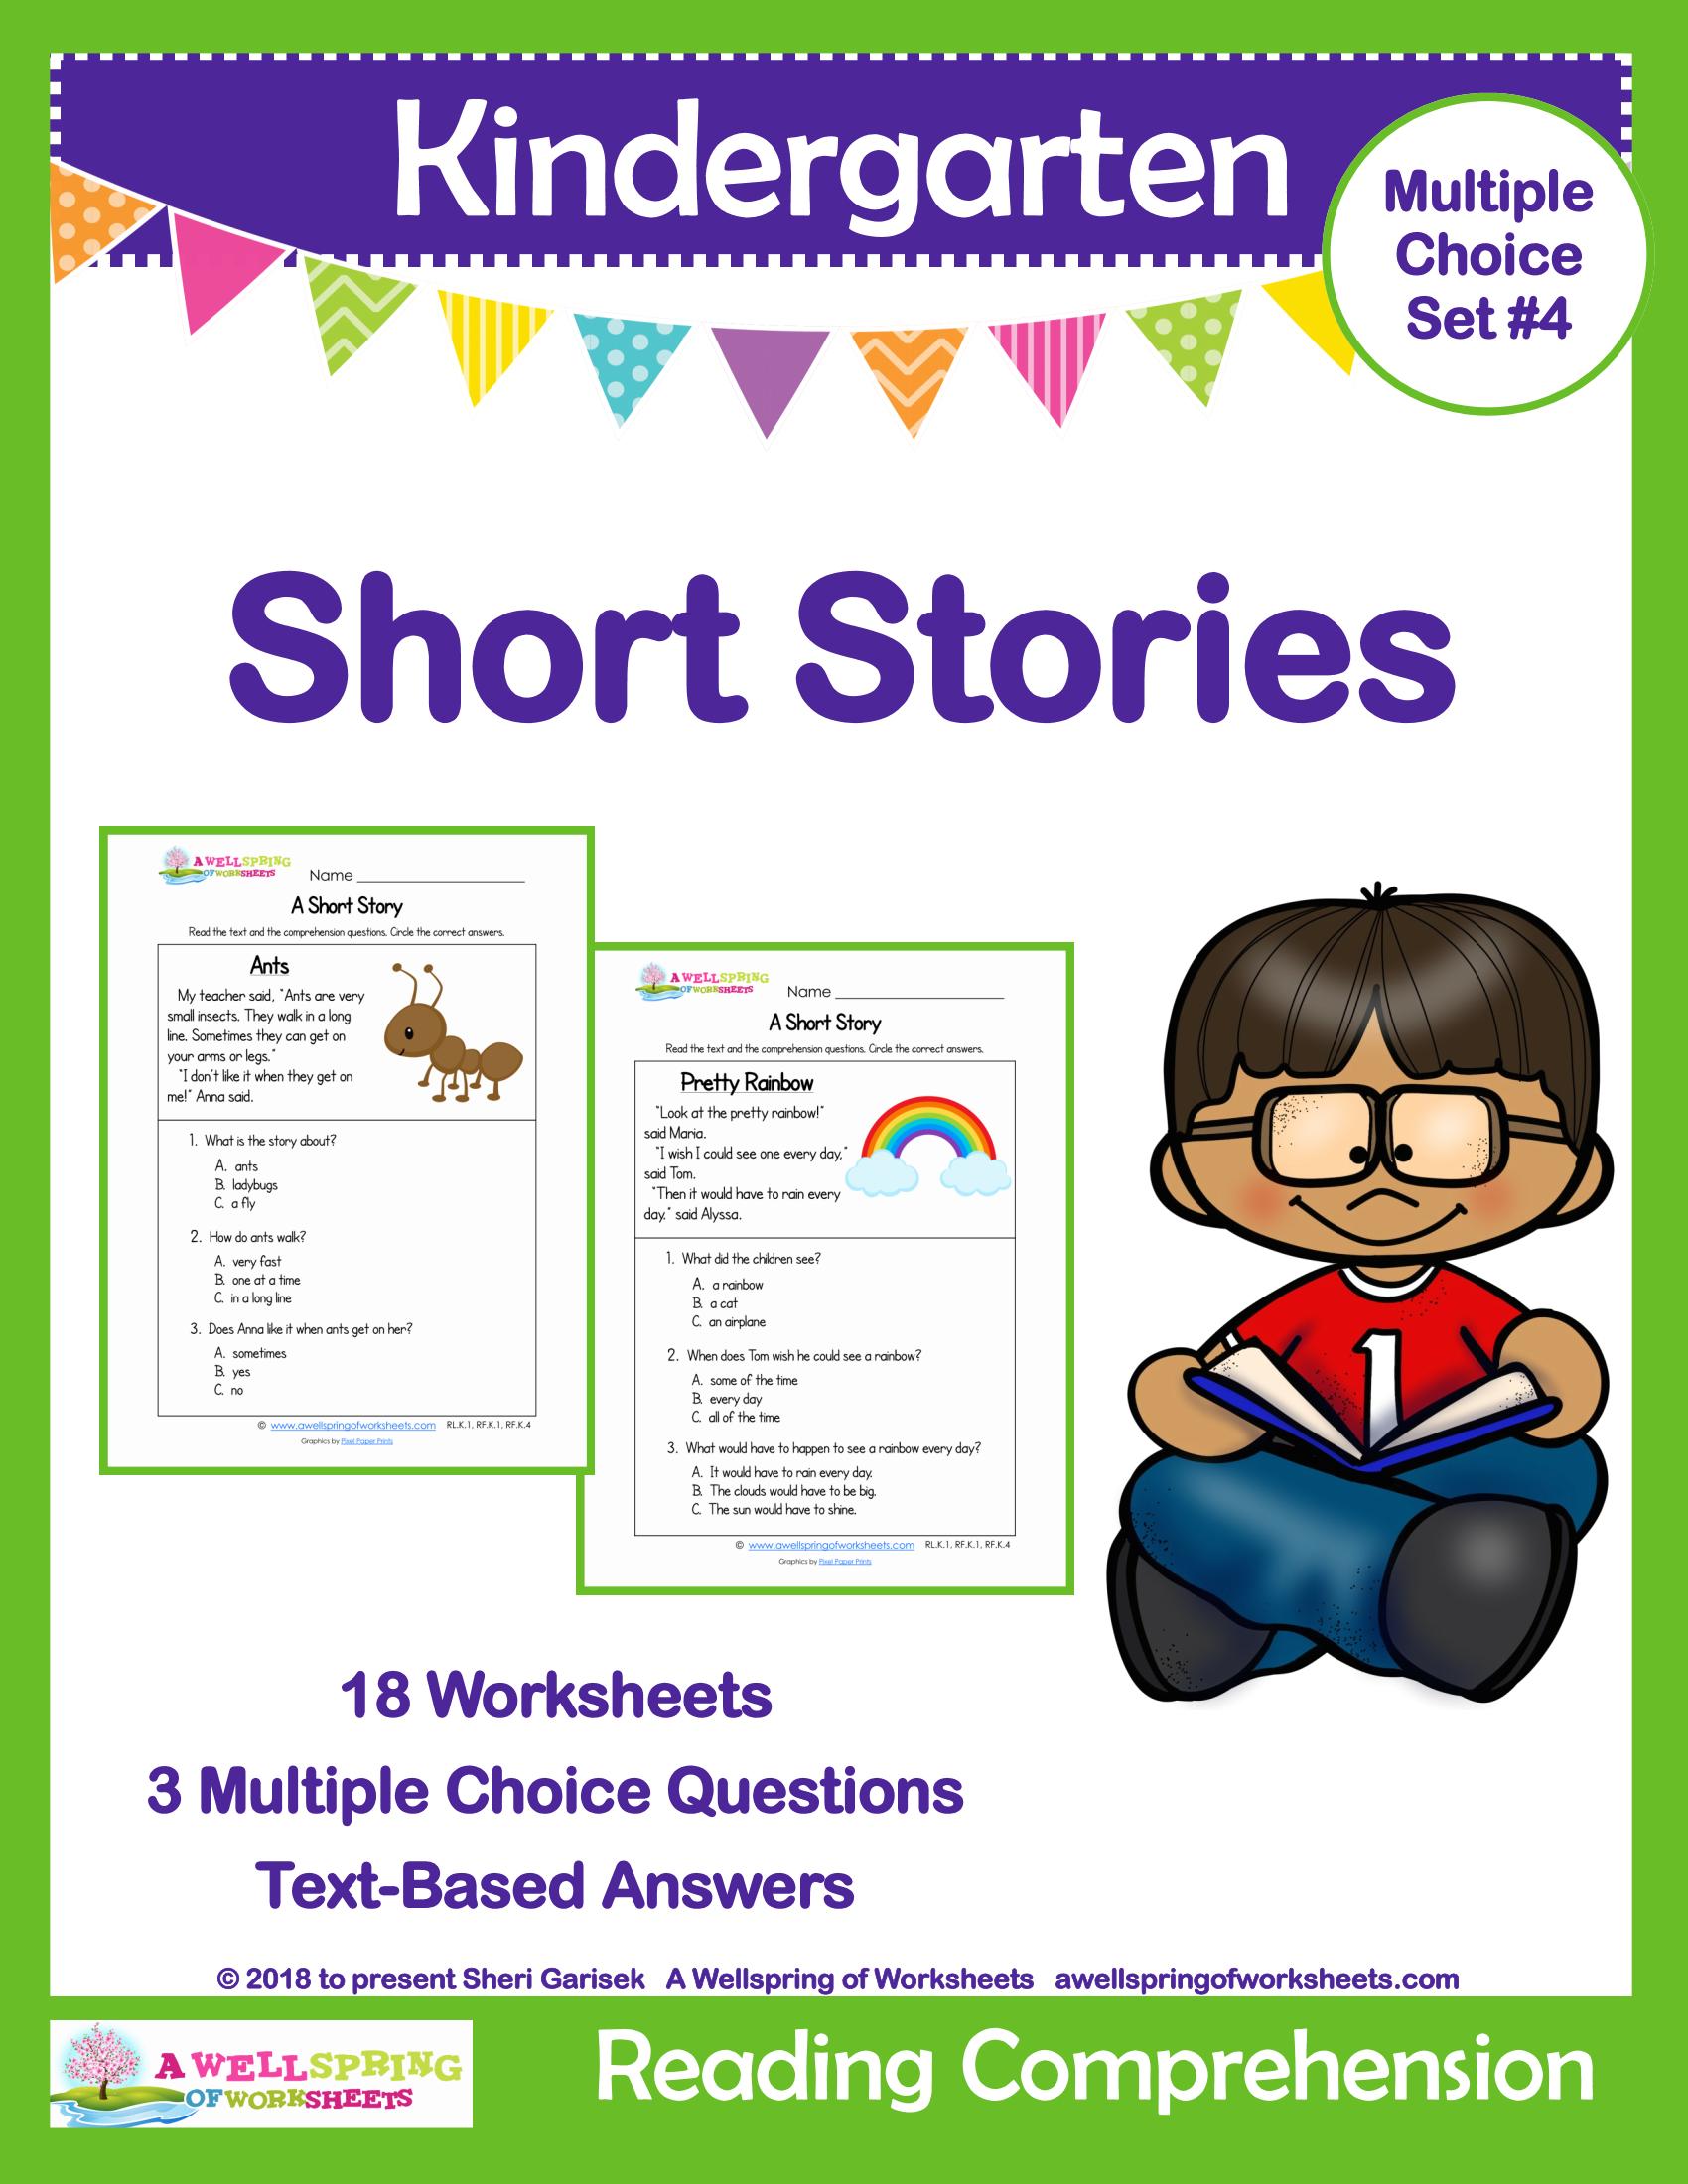 - Kindergarten Short Stories Reading Comprehension, Education